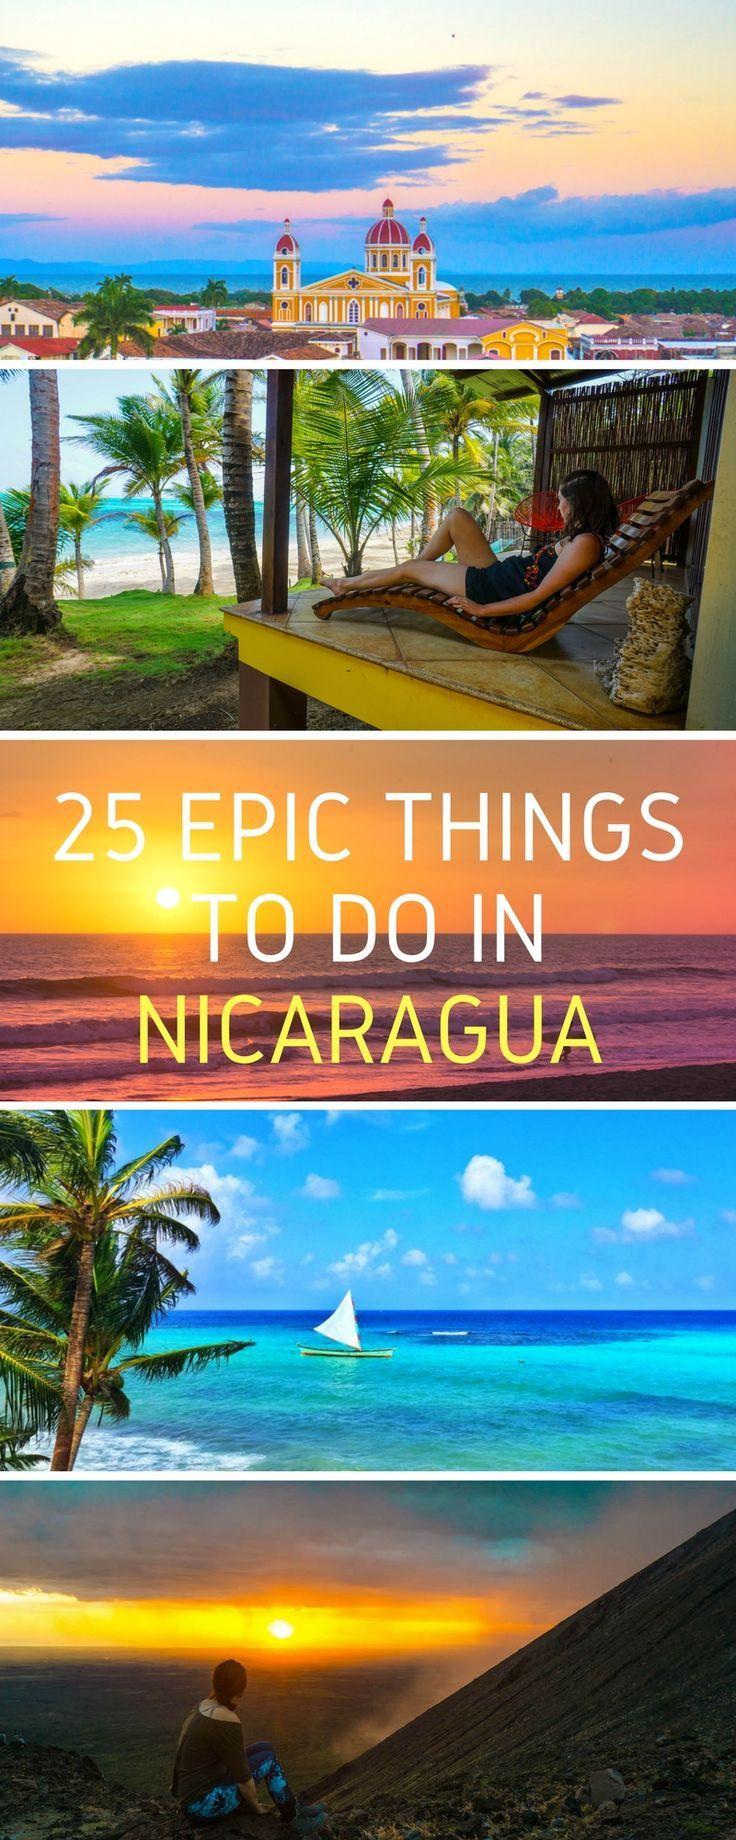 Bucket list adventures abound in Nicaragua! Surf in San Juan de Sur, scuba on Little Corn, board down active volcanoes in Leon, and admire the colonial beauty of Granada.